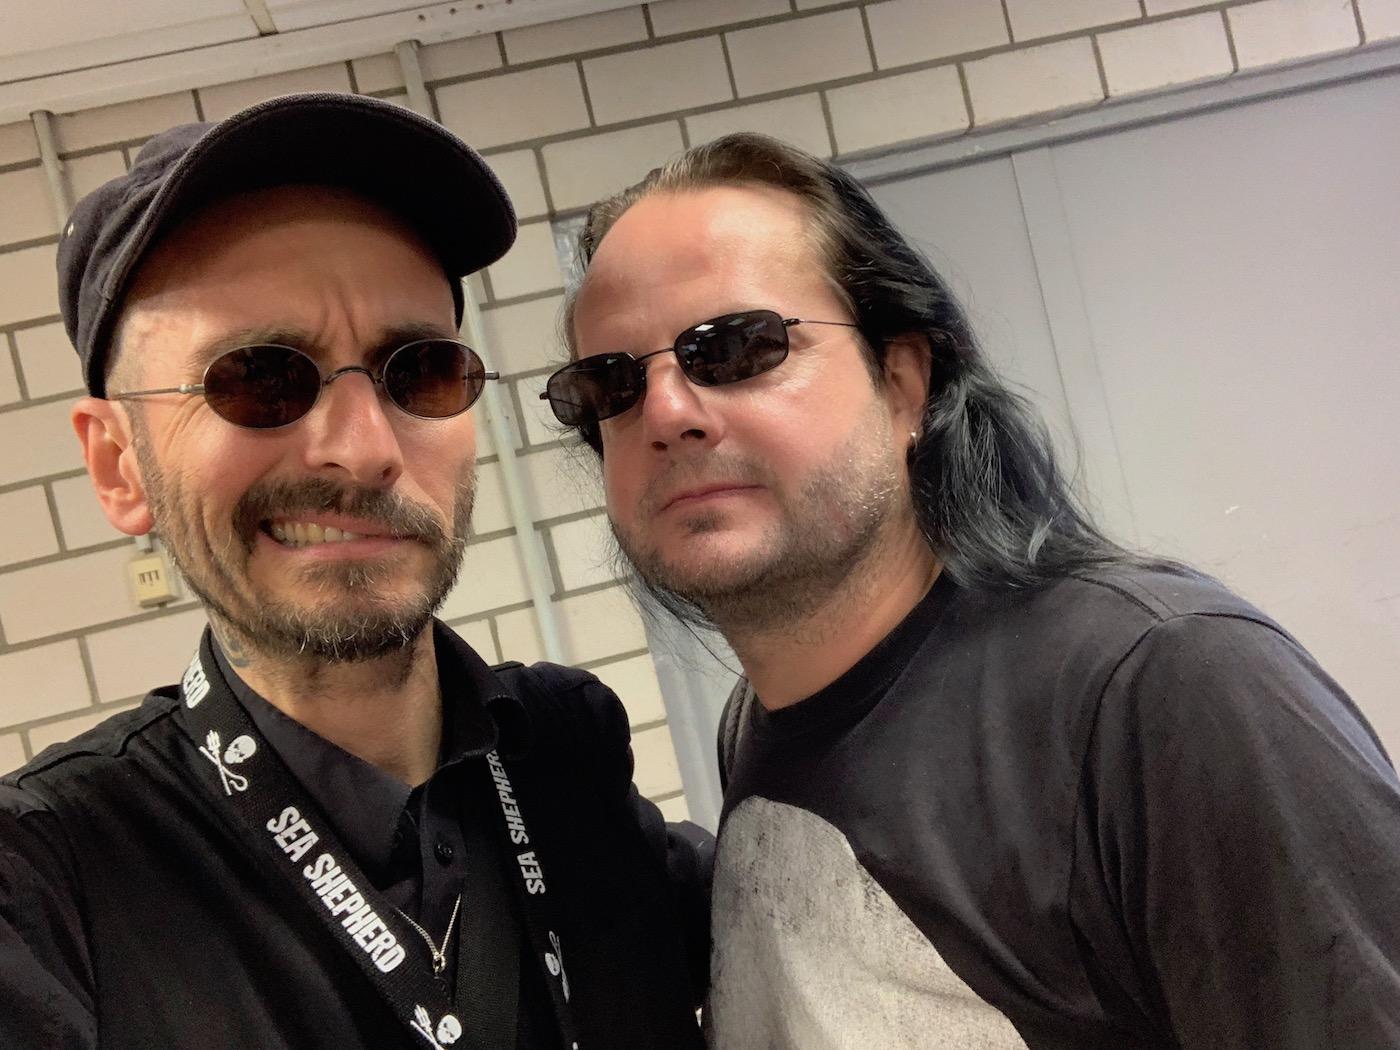 mark_benecke_amphi_festival_koeln_2019 - 31.jpg